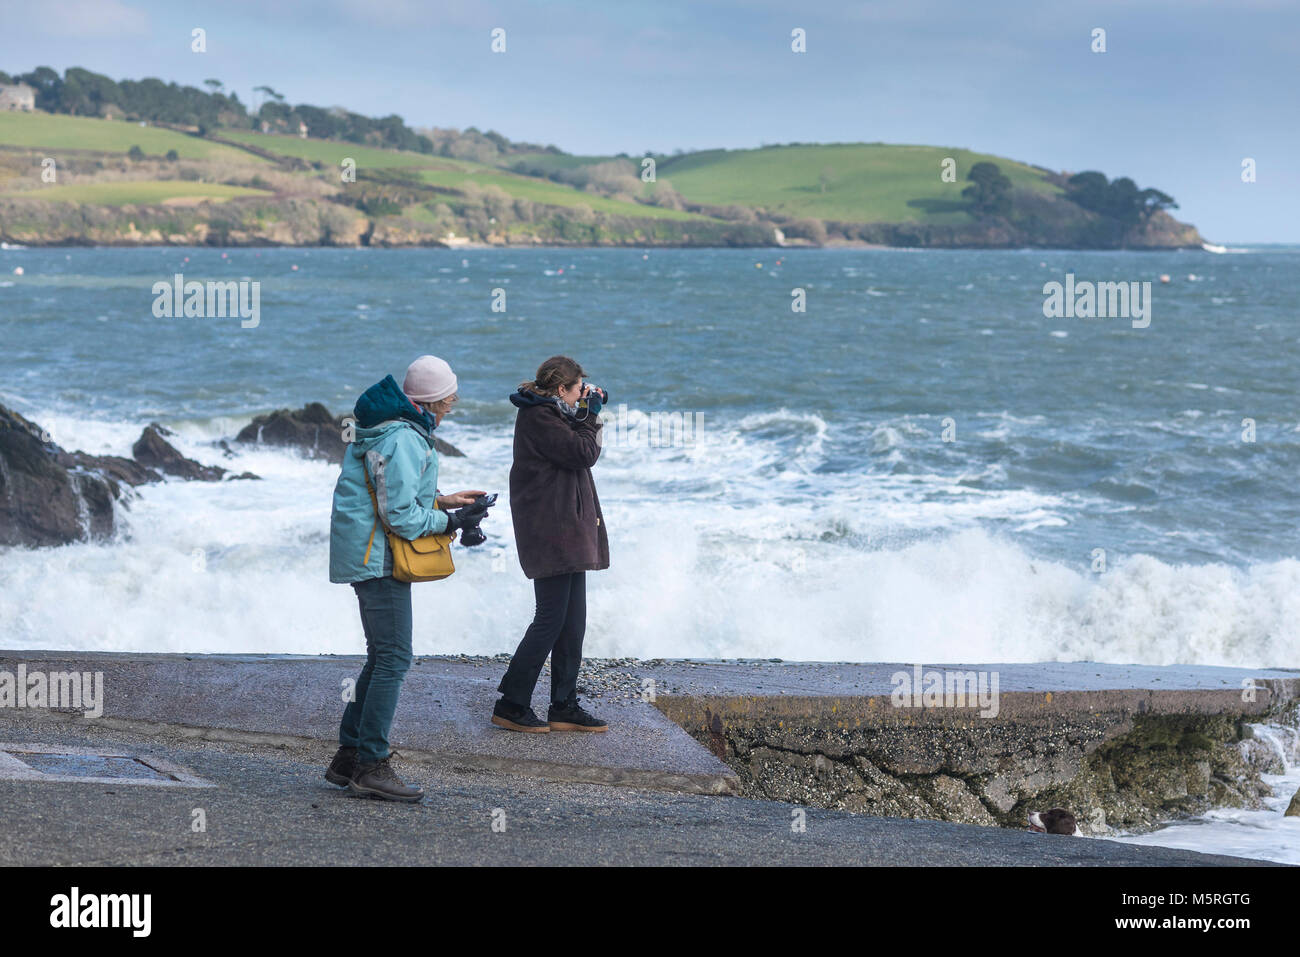 Touristen fotografieren am Strand im Trebah Garten Gärten in Cornwall. Stockbild